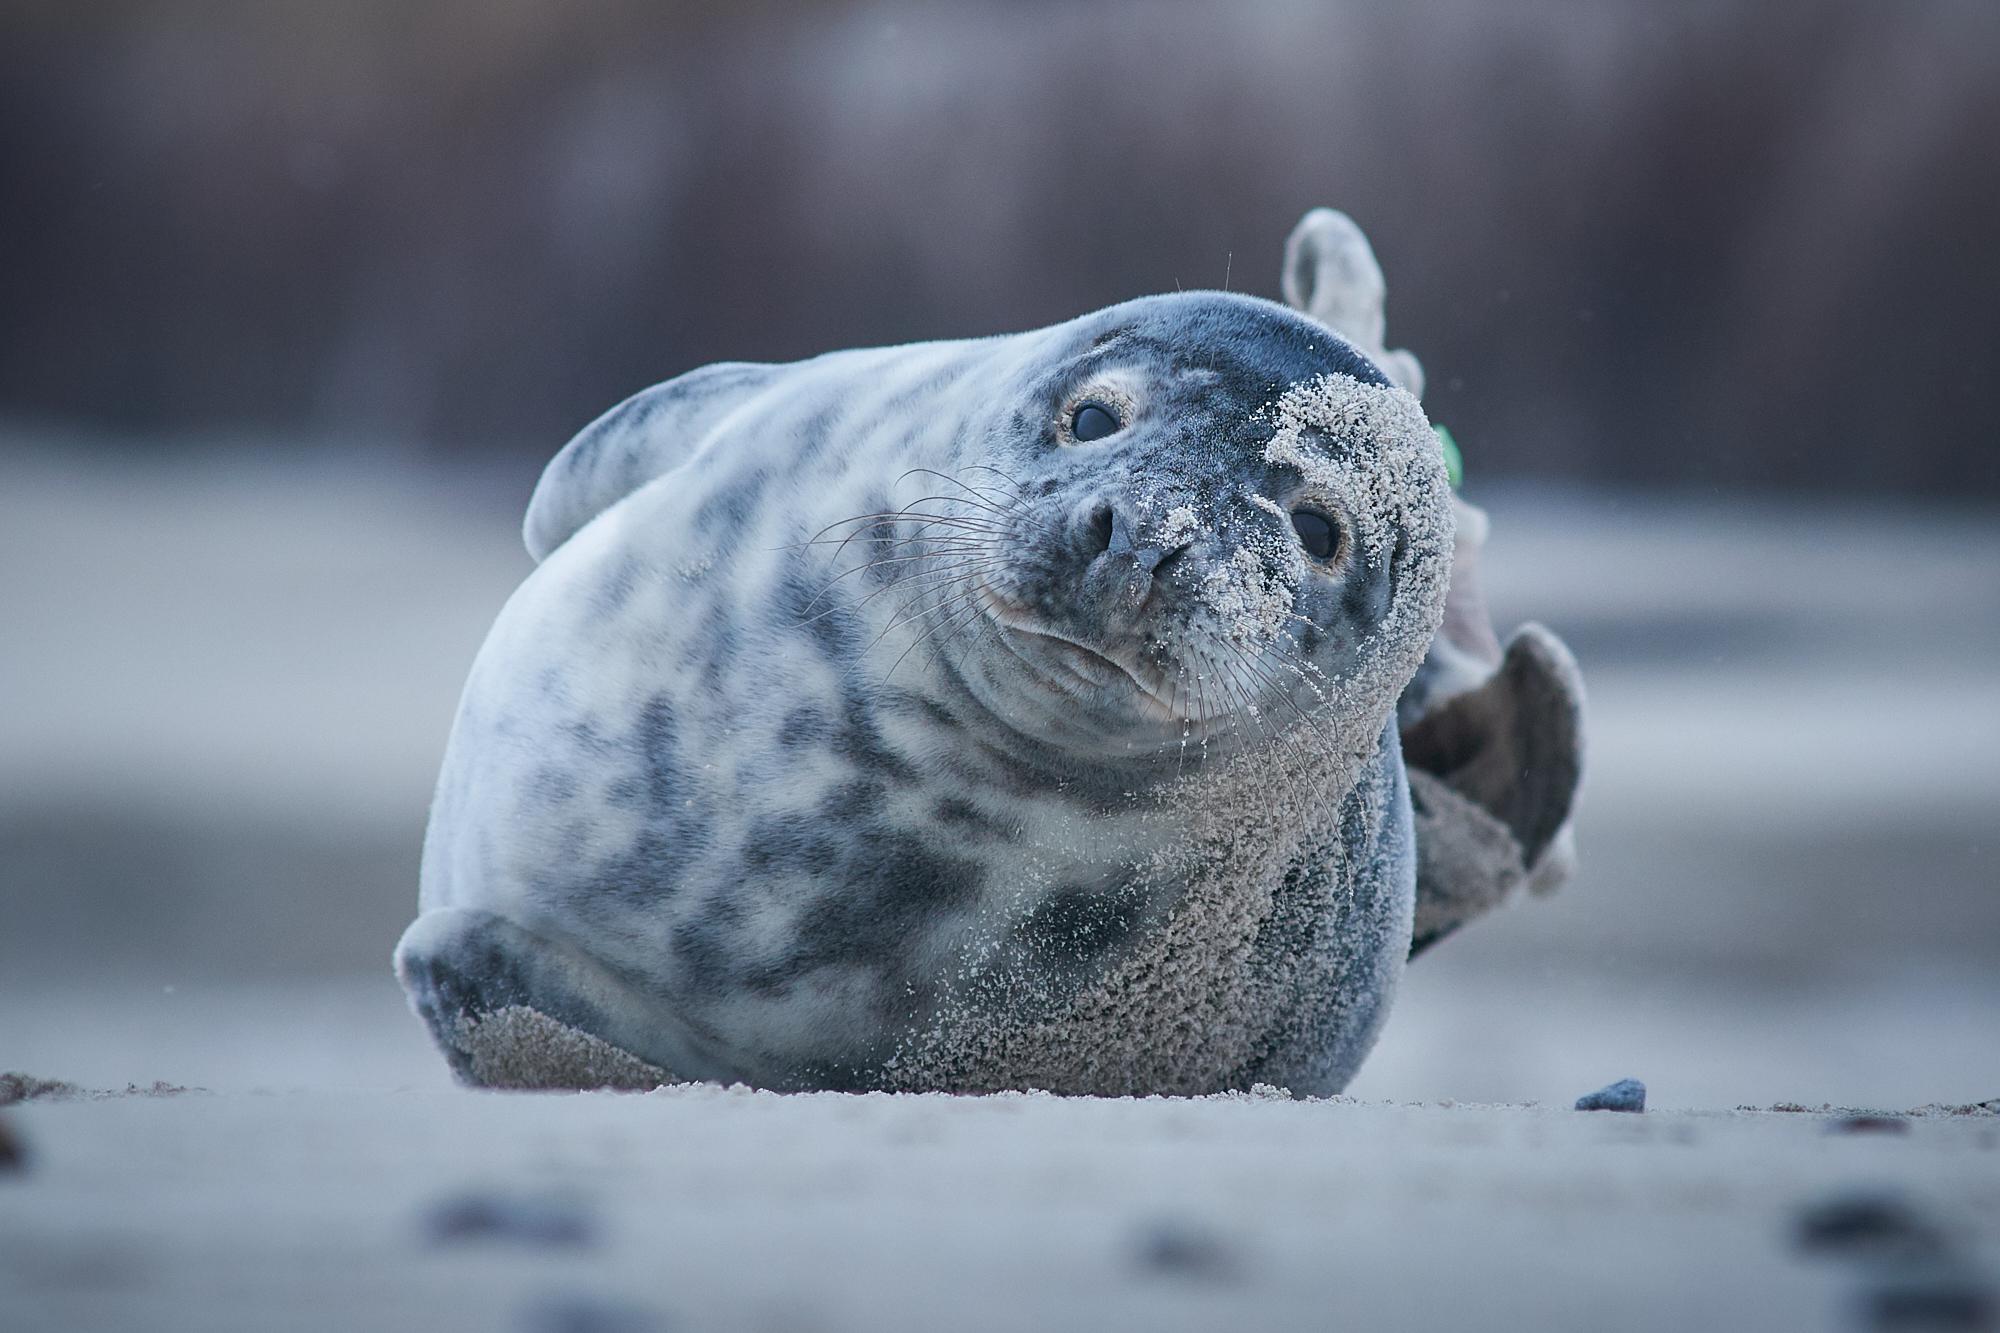 DMZ_4564 - Seal.jpg